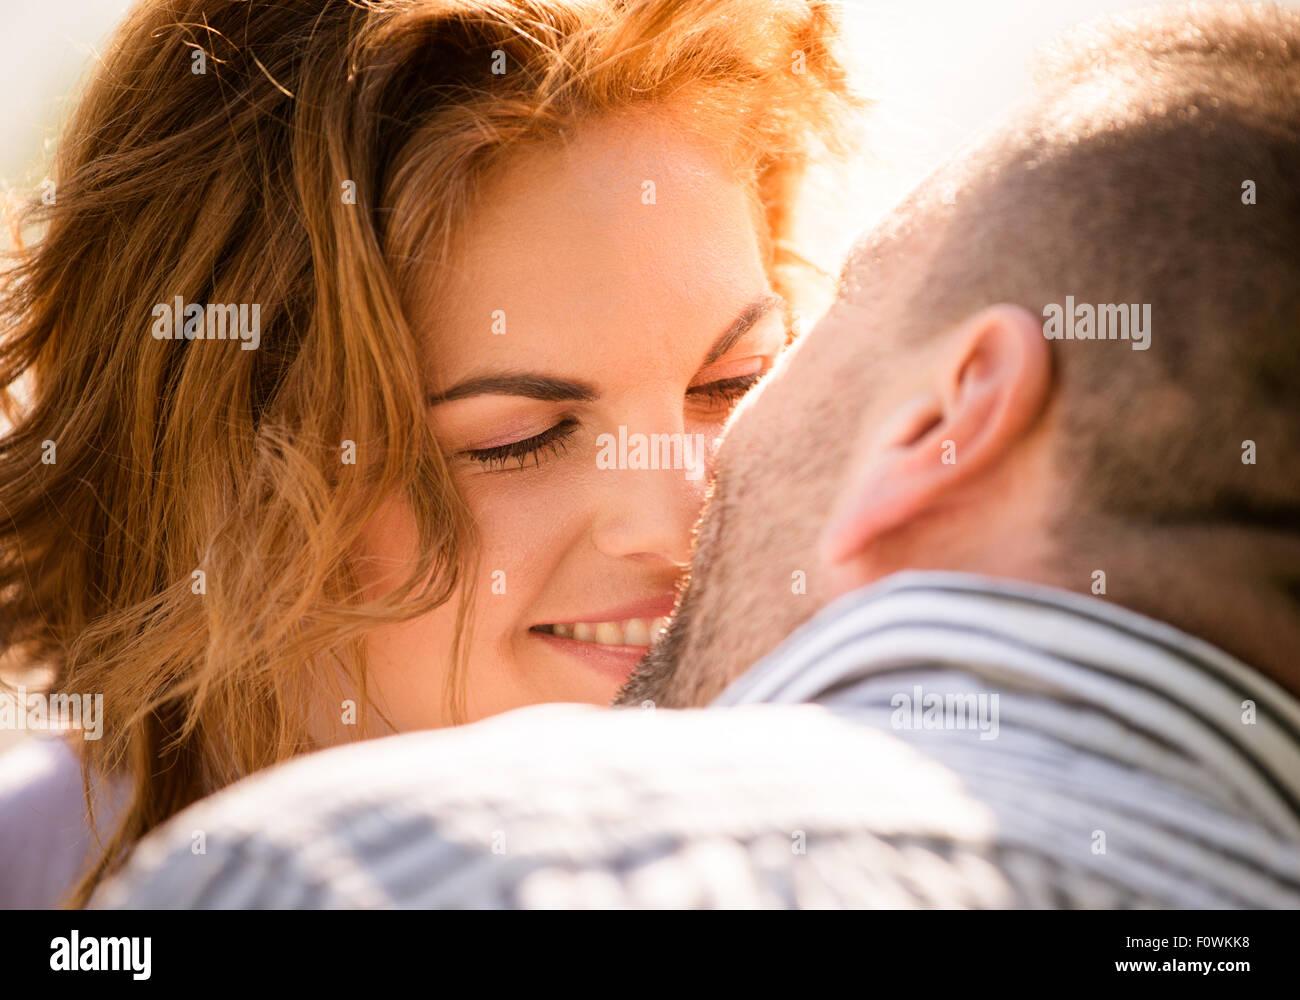 Candid Nahaufnahme Foto des Mannes küssen junge lächelnde Frau Stockbild